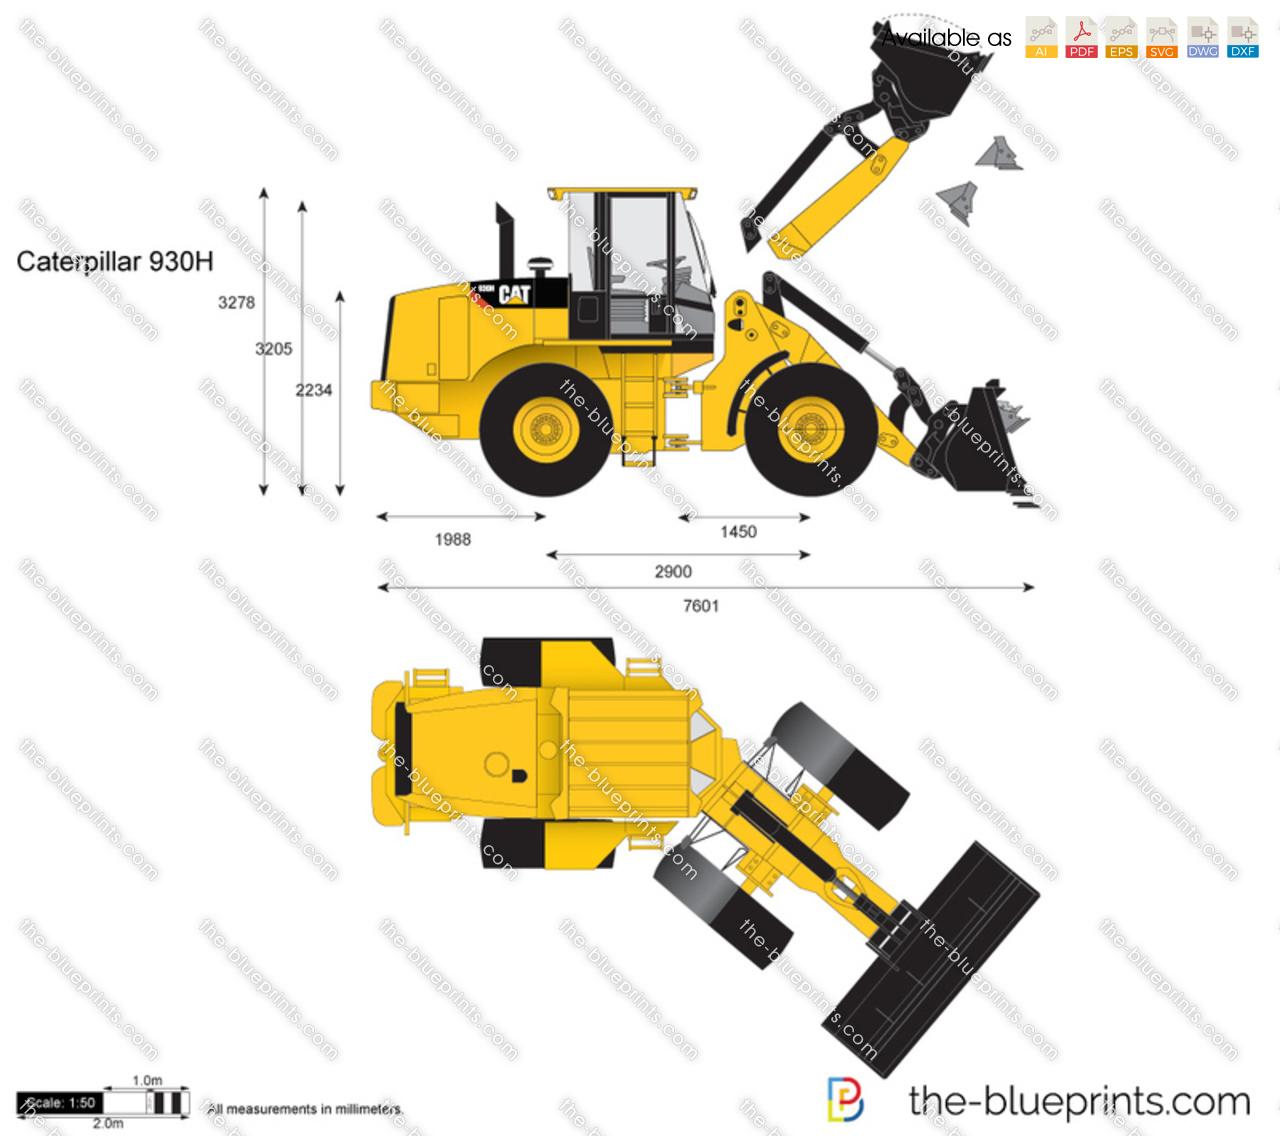 The blueprints com vector drawing caterpillar 930h wheel loader